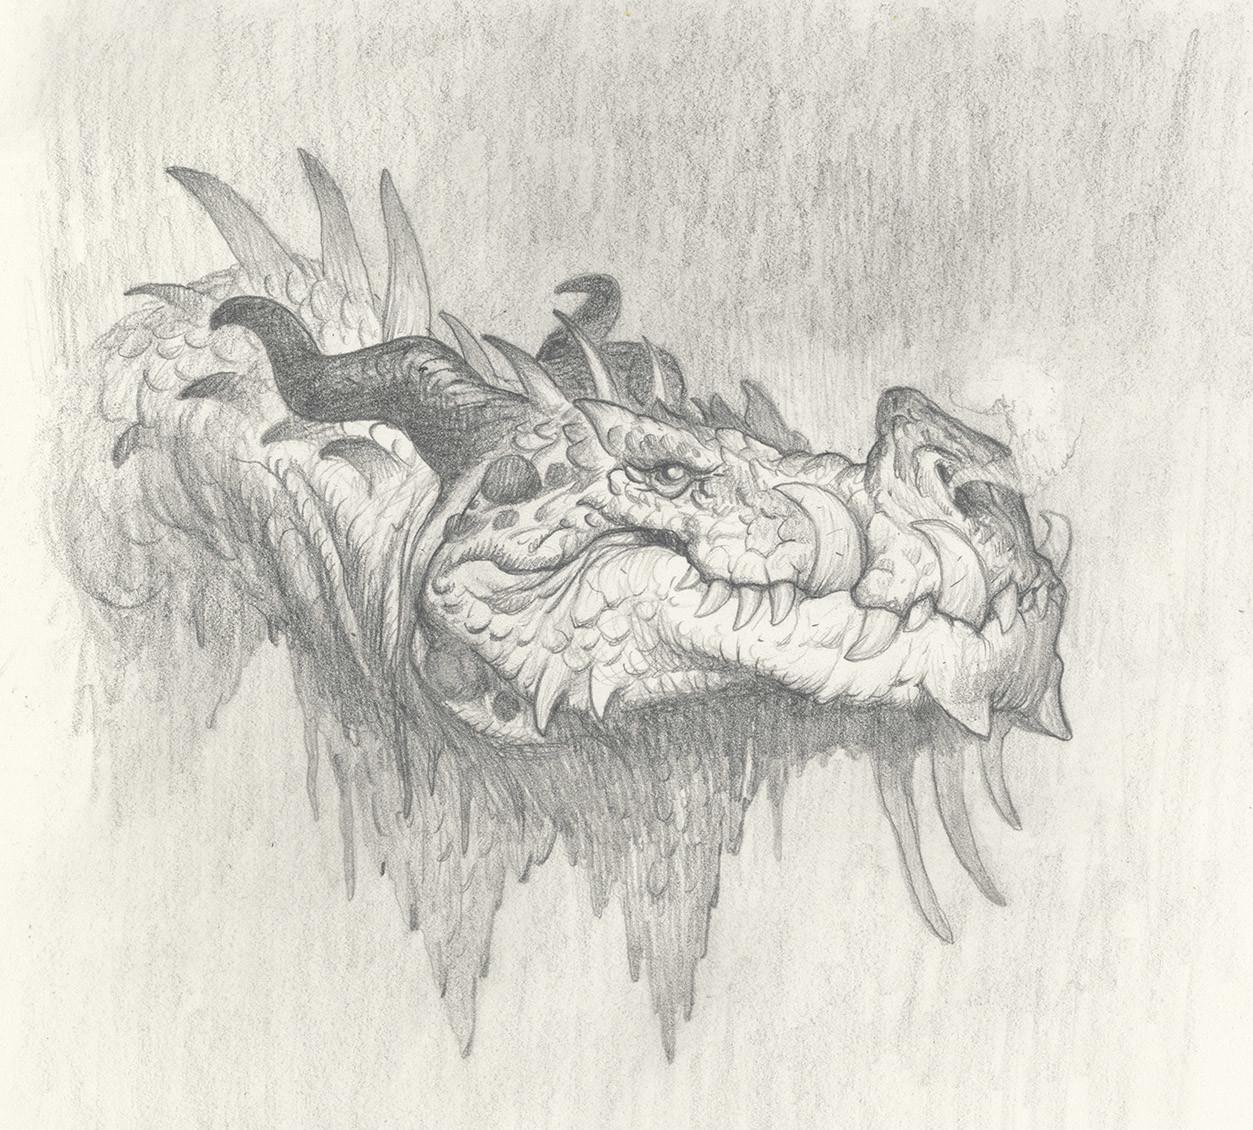 Exploratory Sketch (graphite)